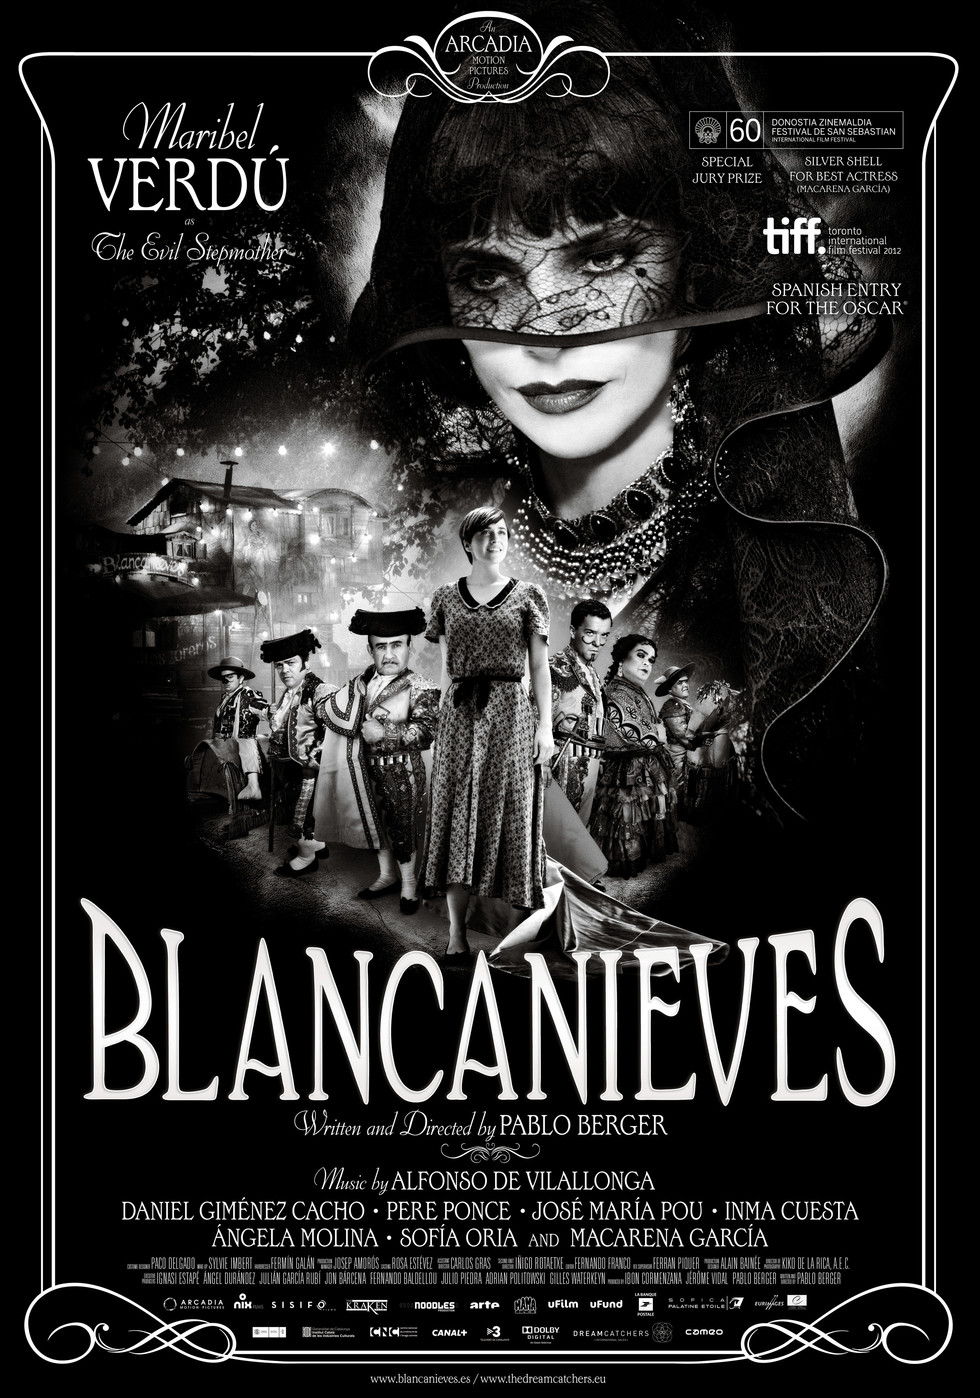 Blancanieves - Movie Poster #1 (Large)